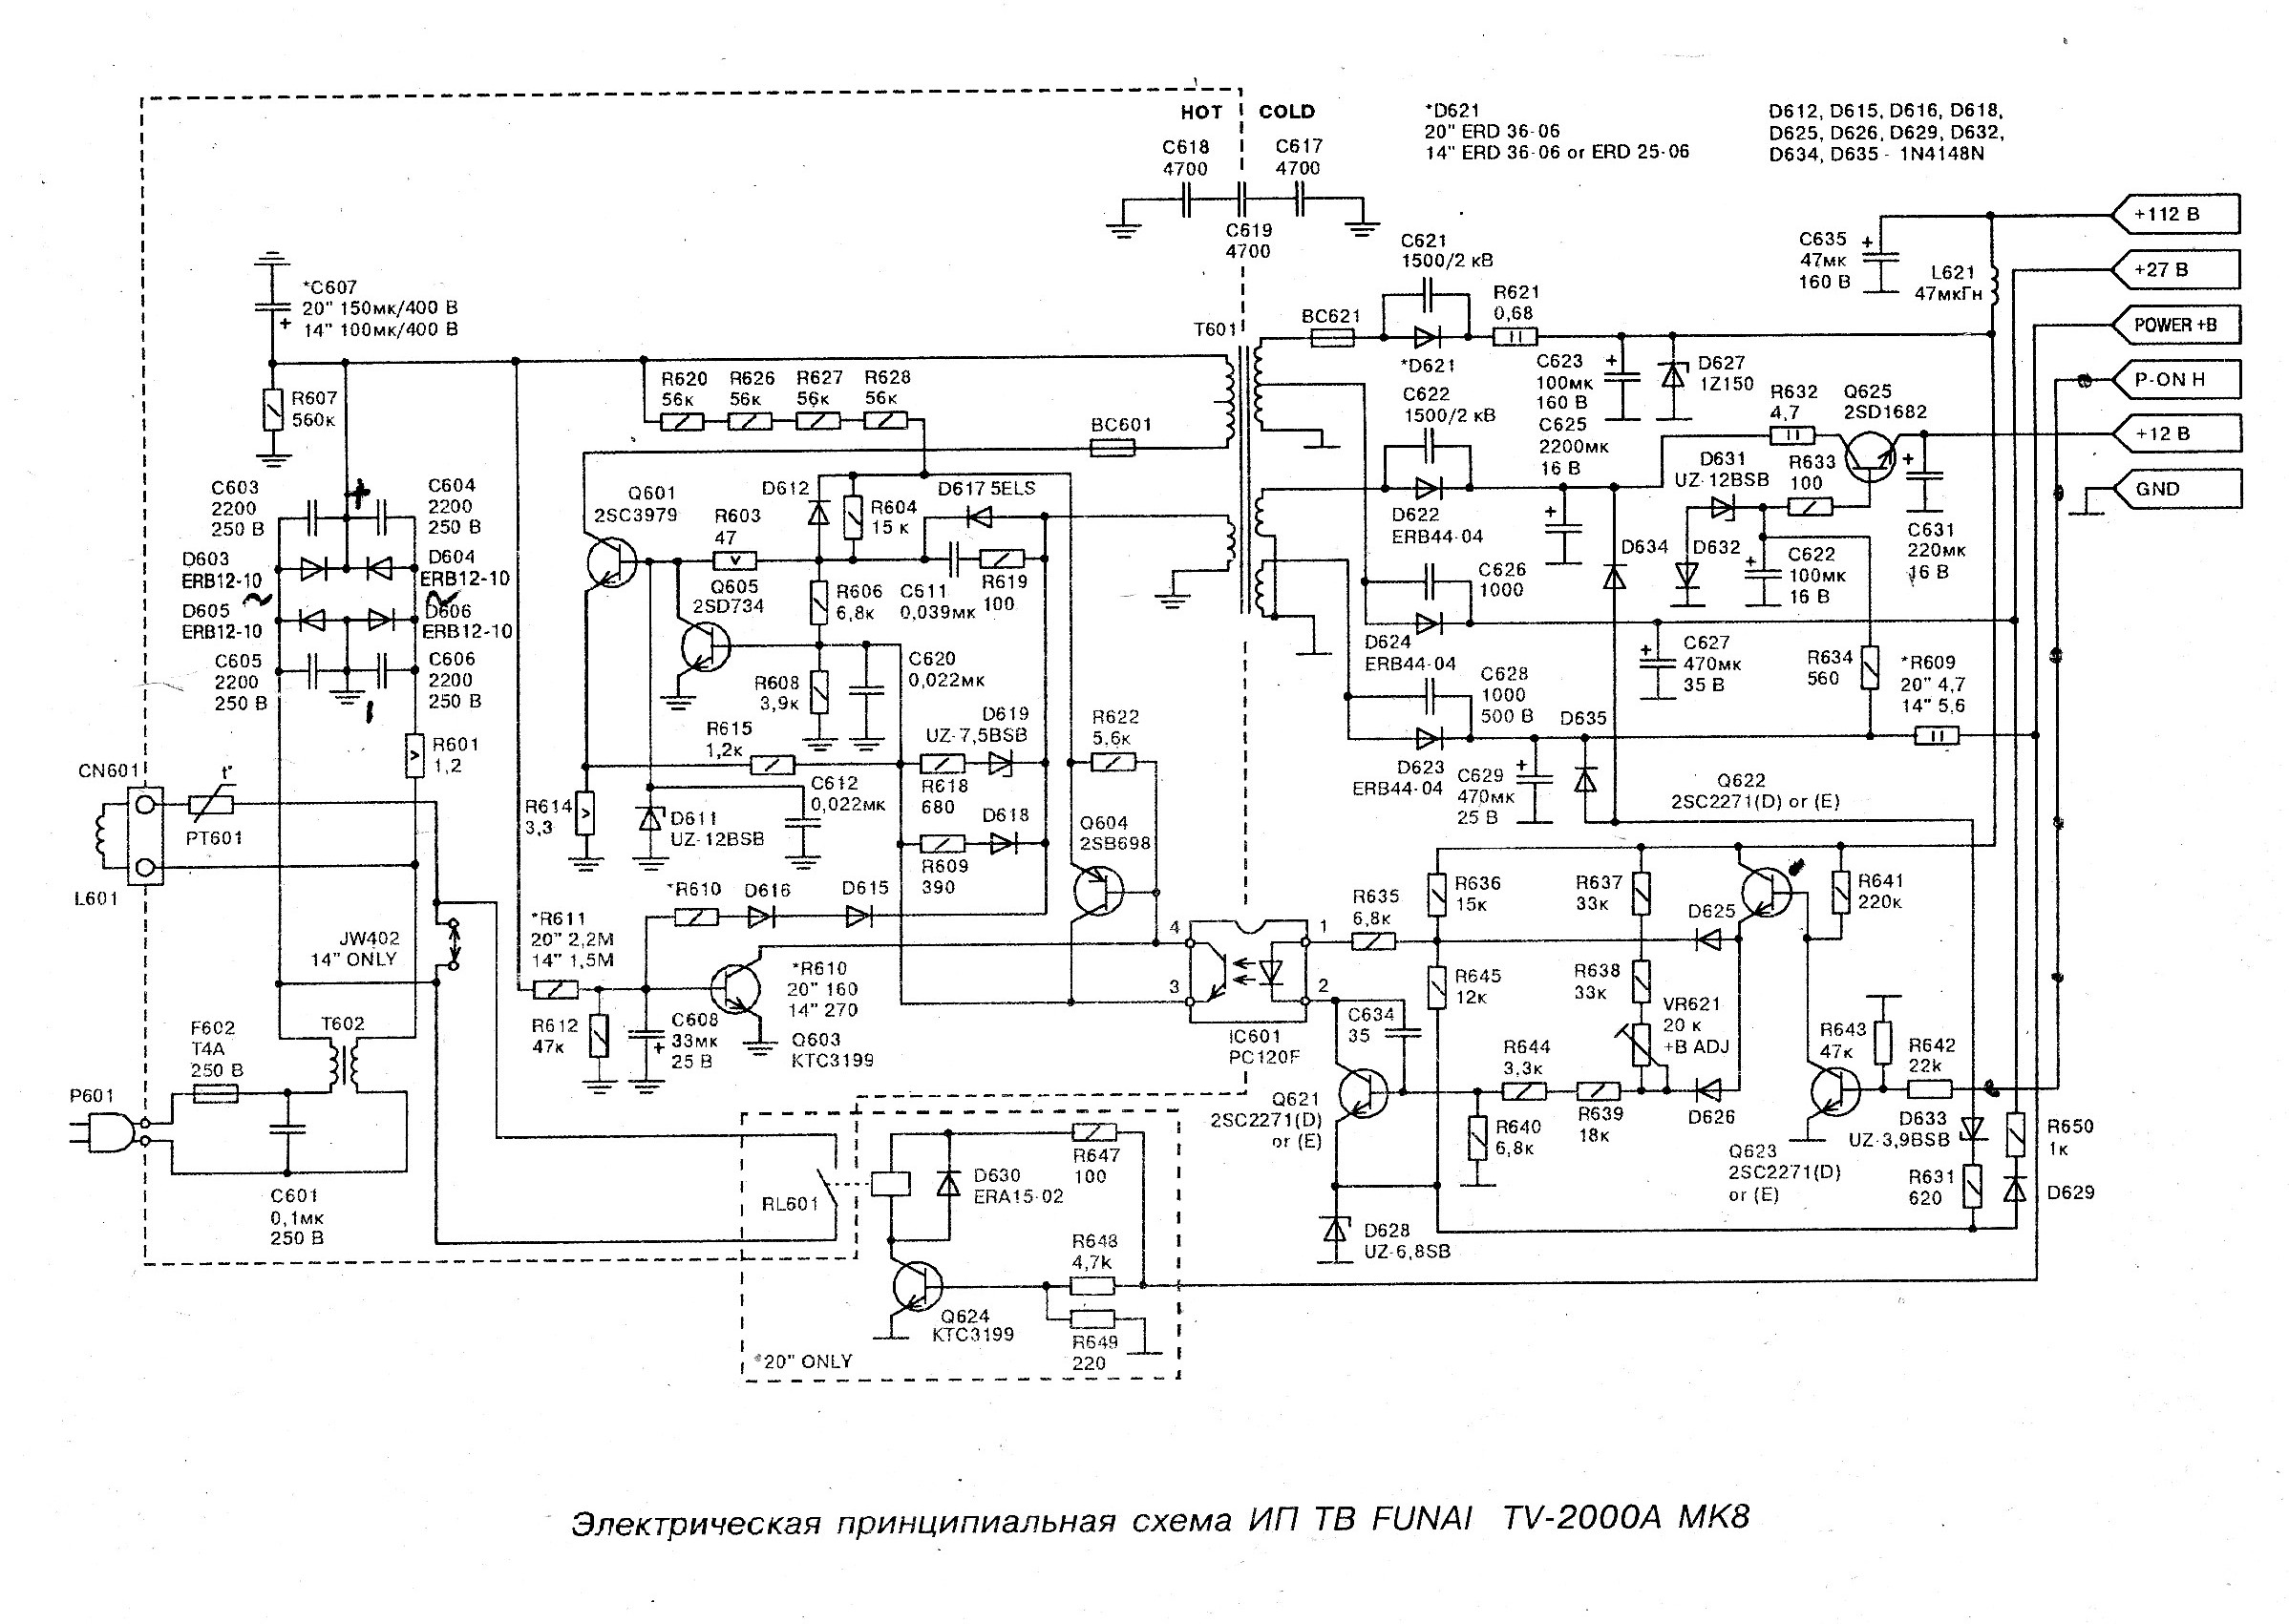 Funai tv 2000a mk10 схема фото 642